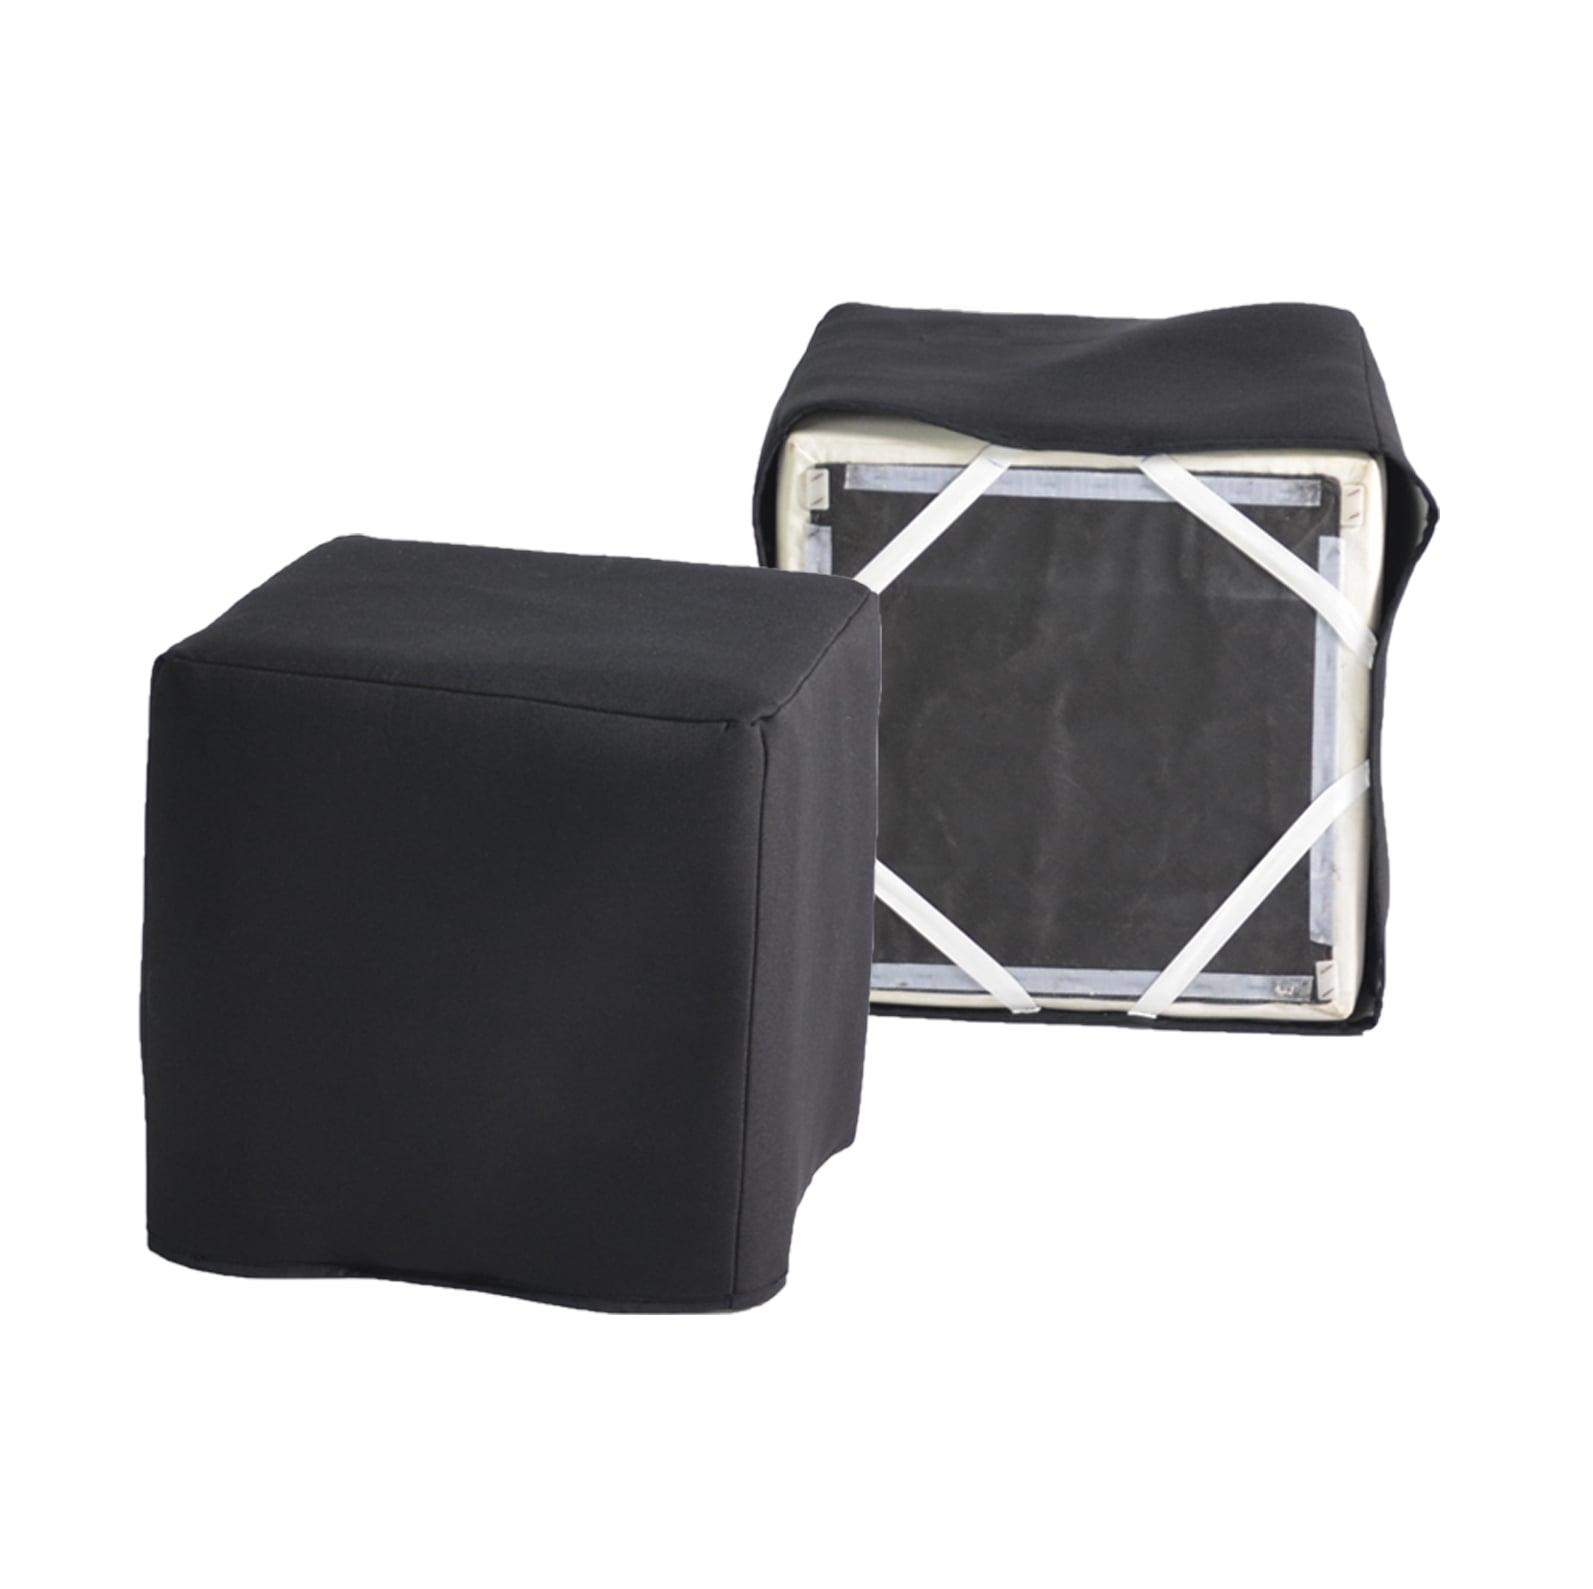 furniture-gategory-min